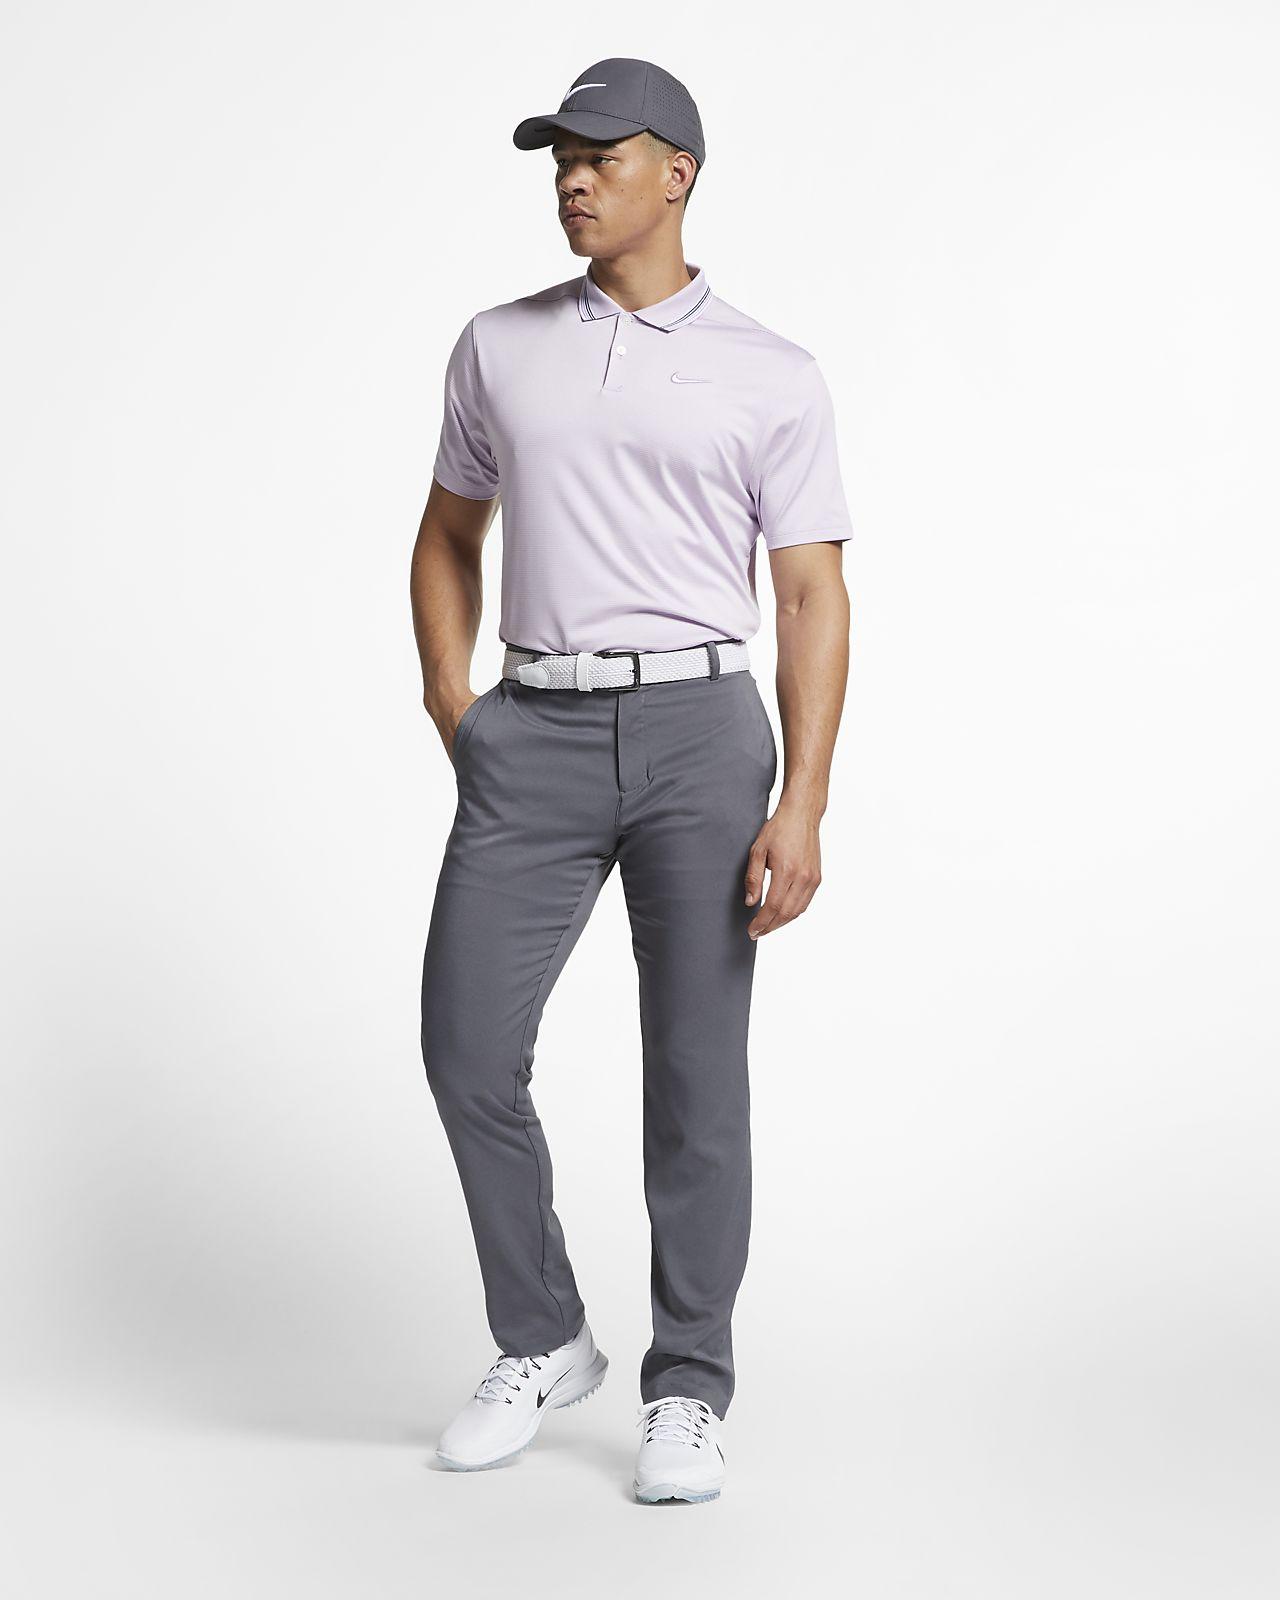 626614dd3 Nike Dri-FIT Vapor Men s Golf Polo. Nike.com